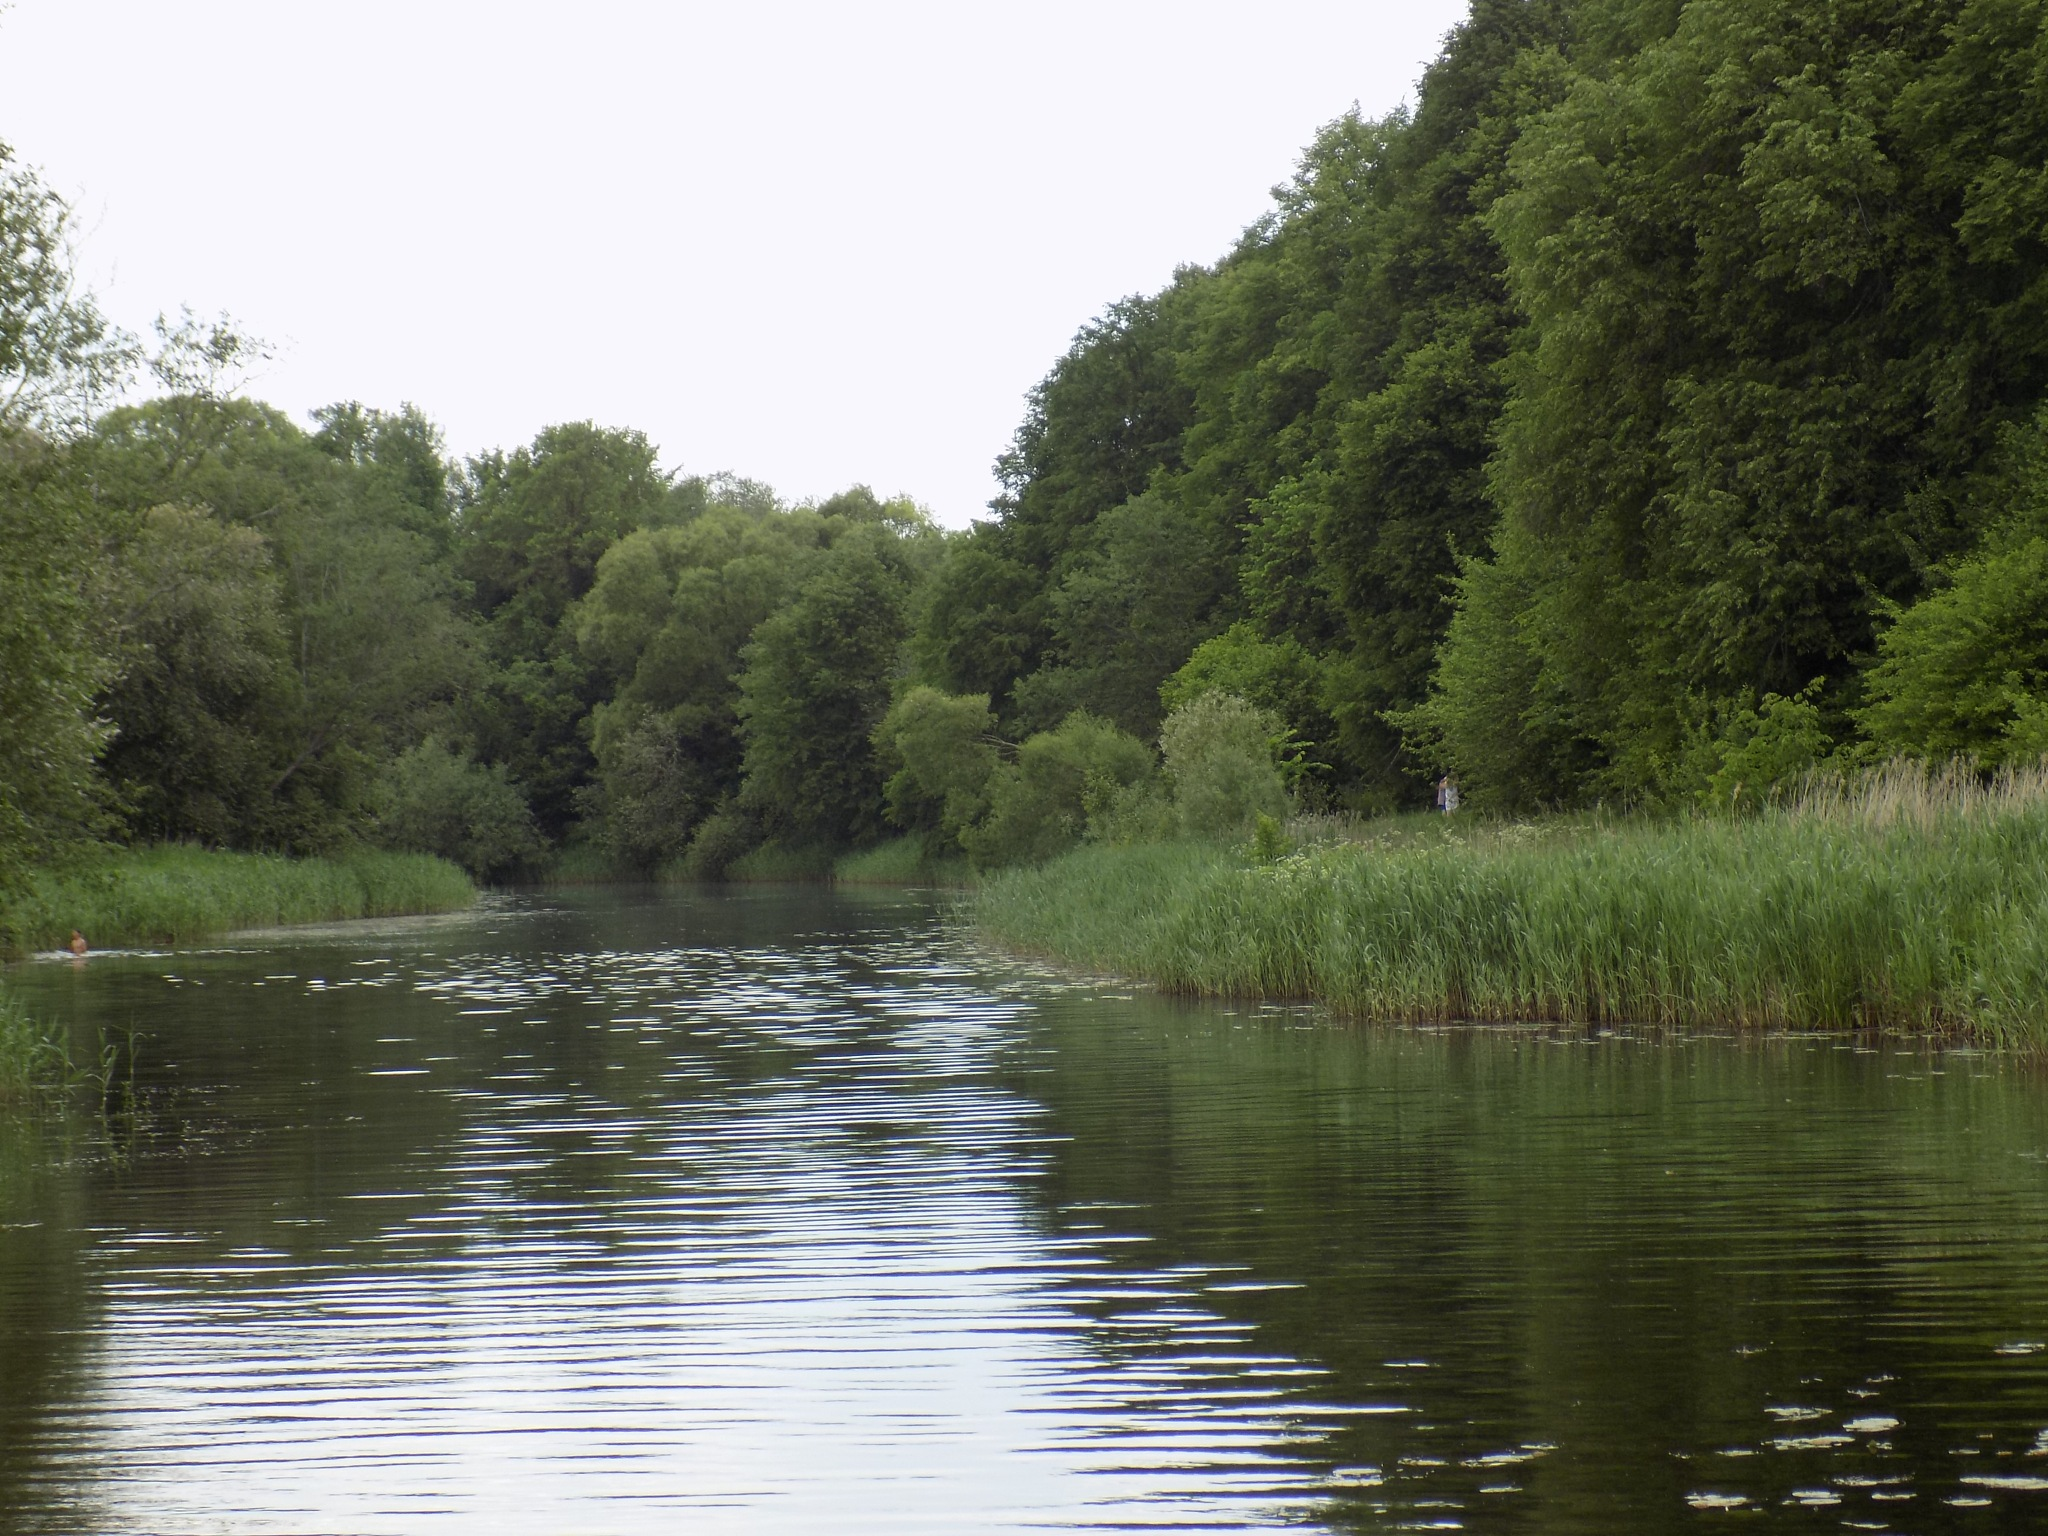 River. by uzkuraitiene62